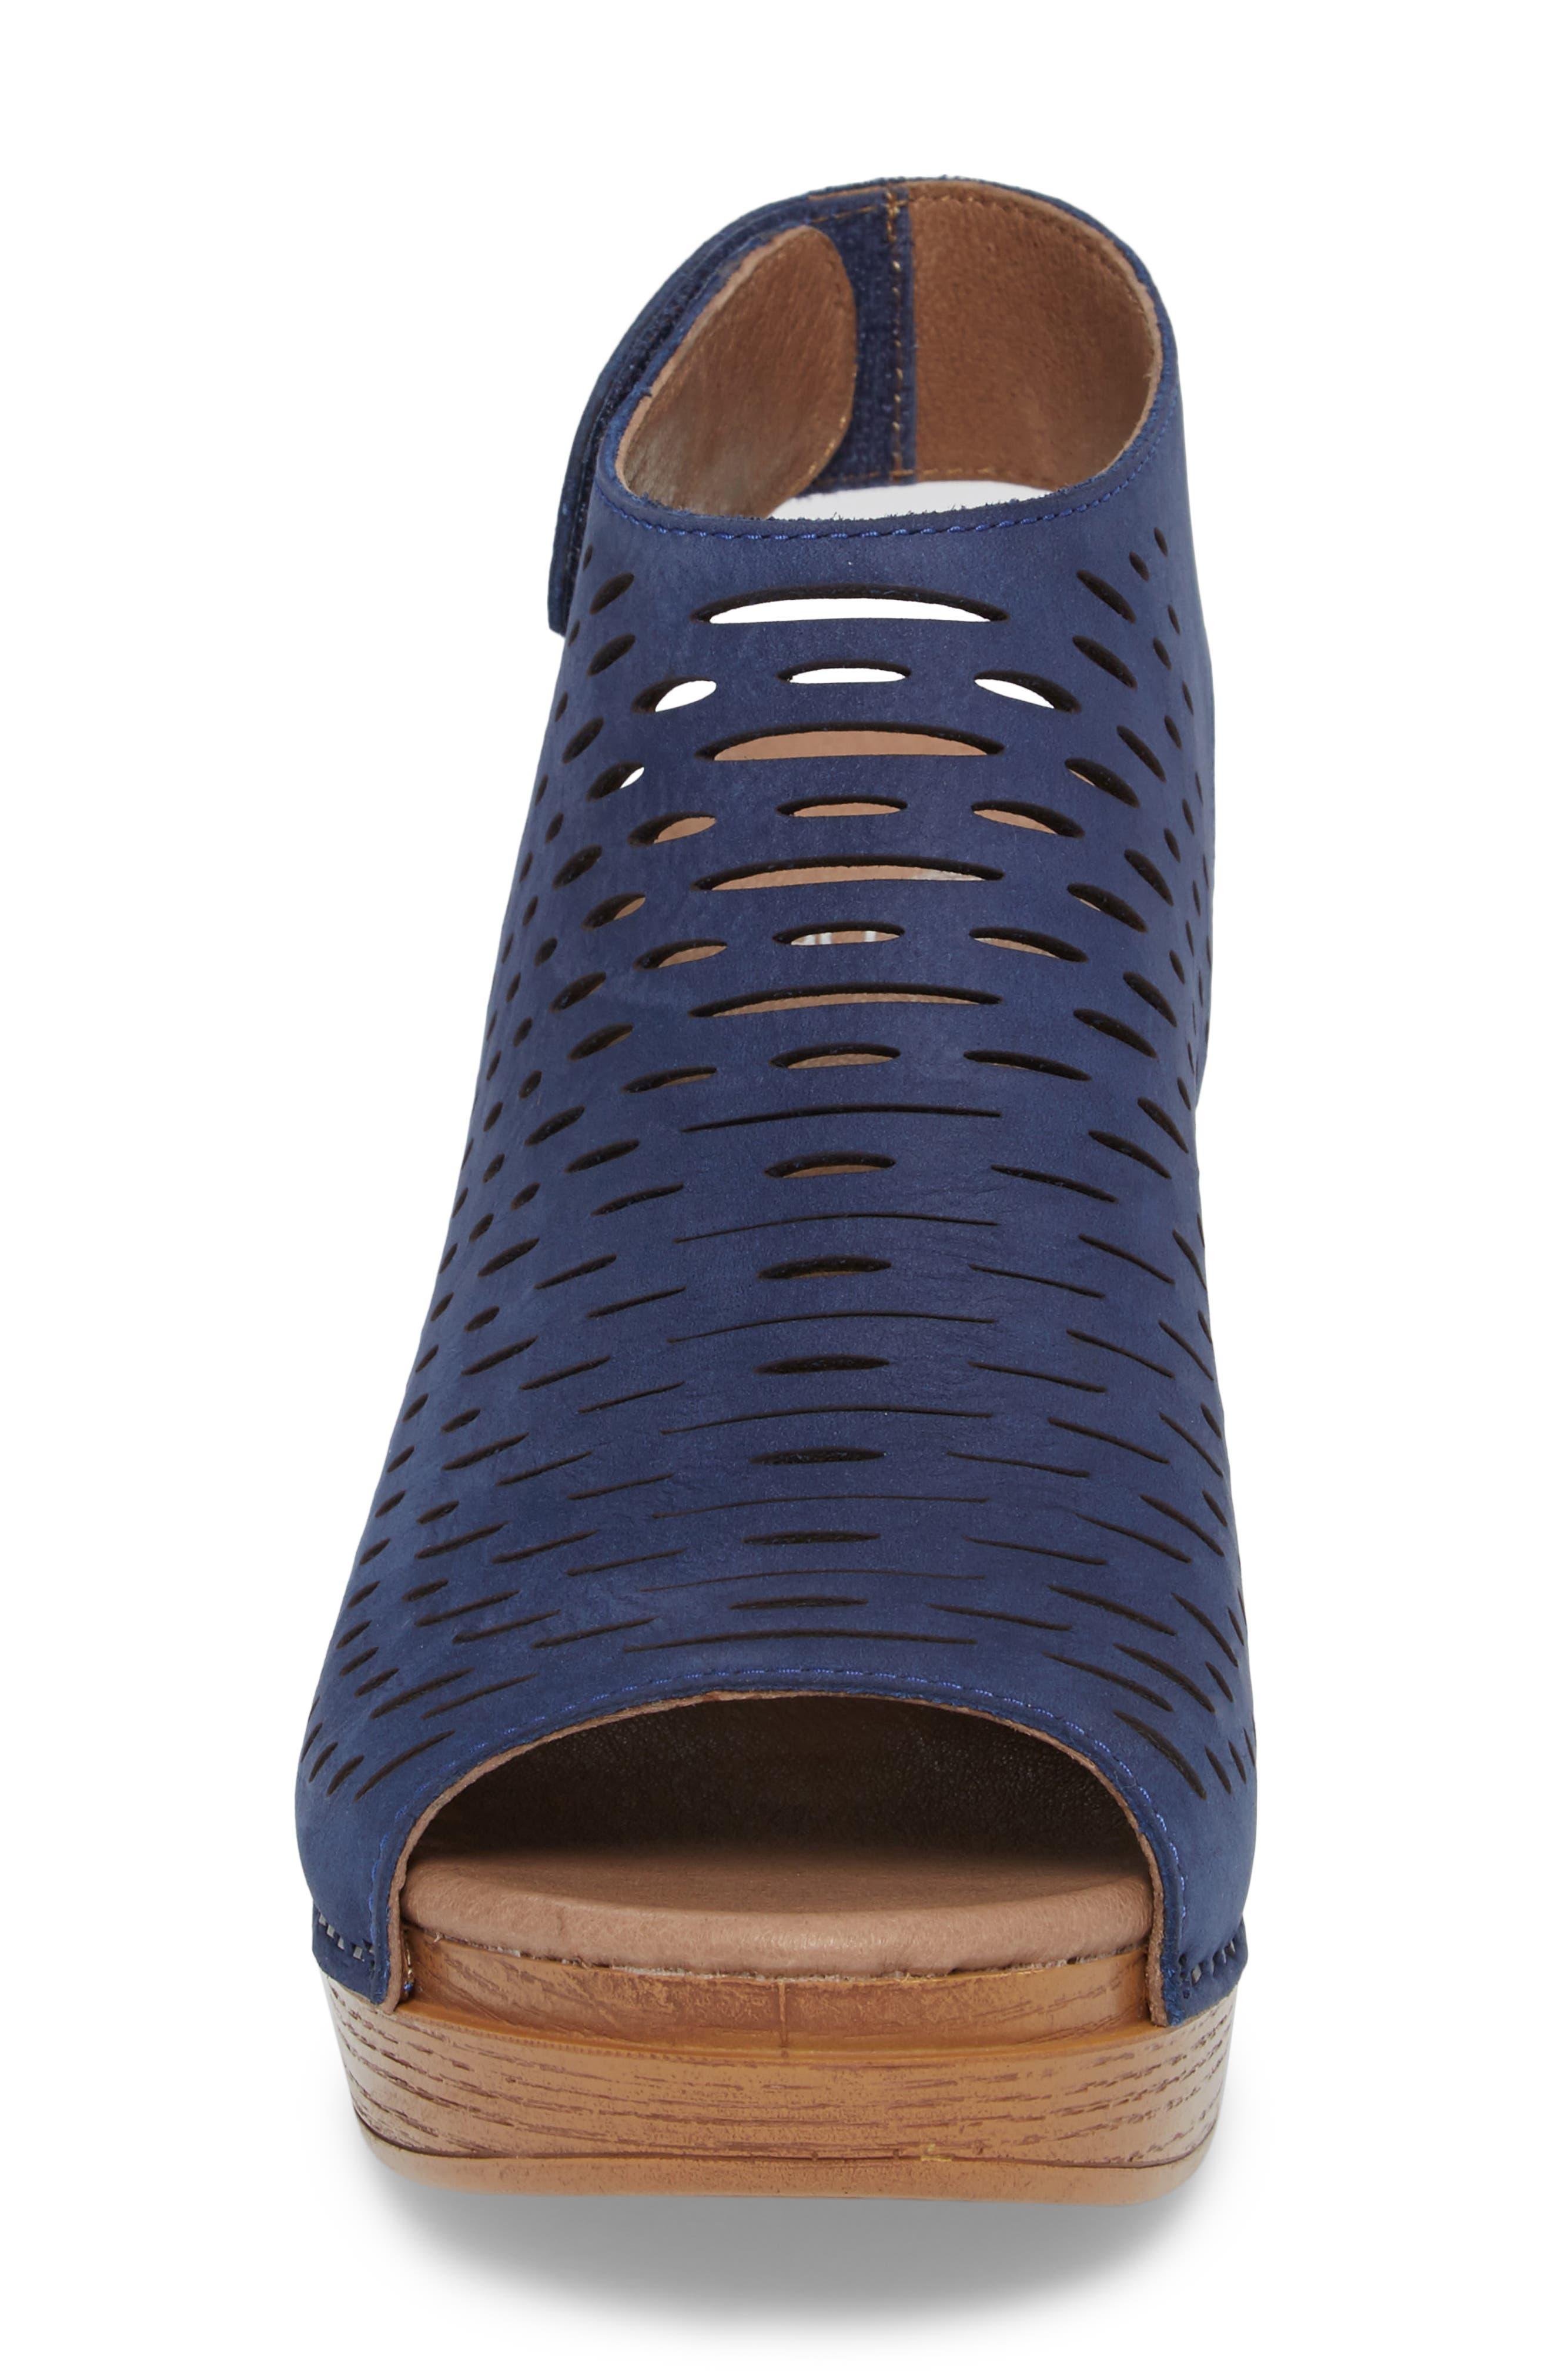 Danae Block Heel Sandal,                             Alternate thumbnail 4, color,                             Blue Milled Nubuck Leather